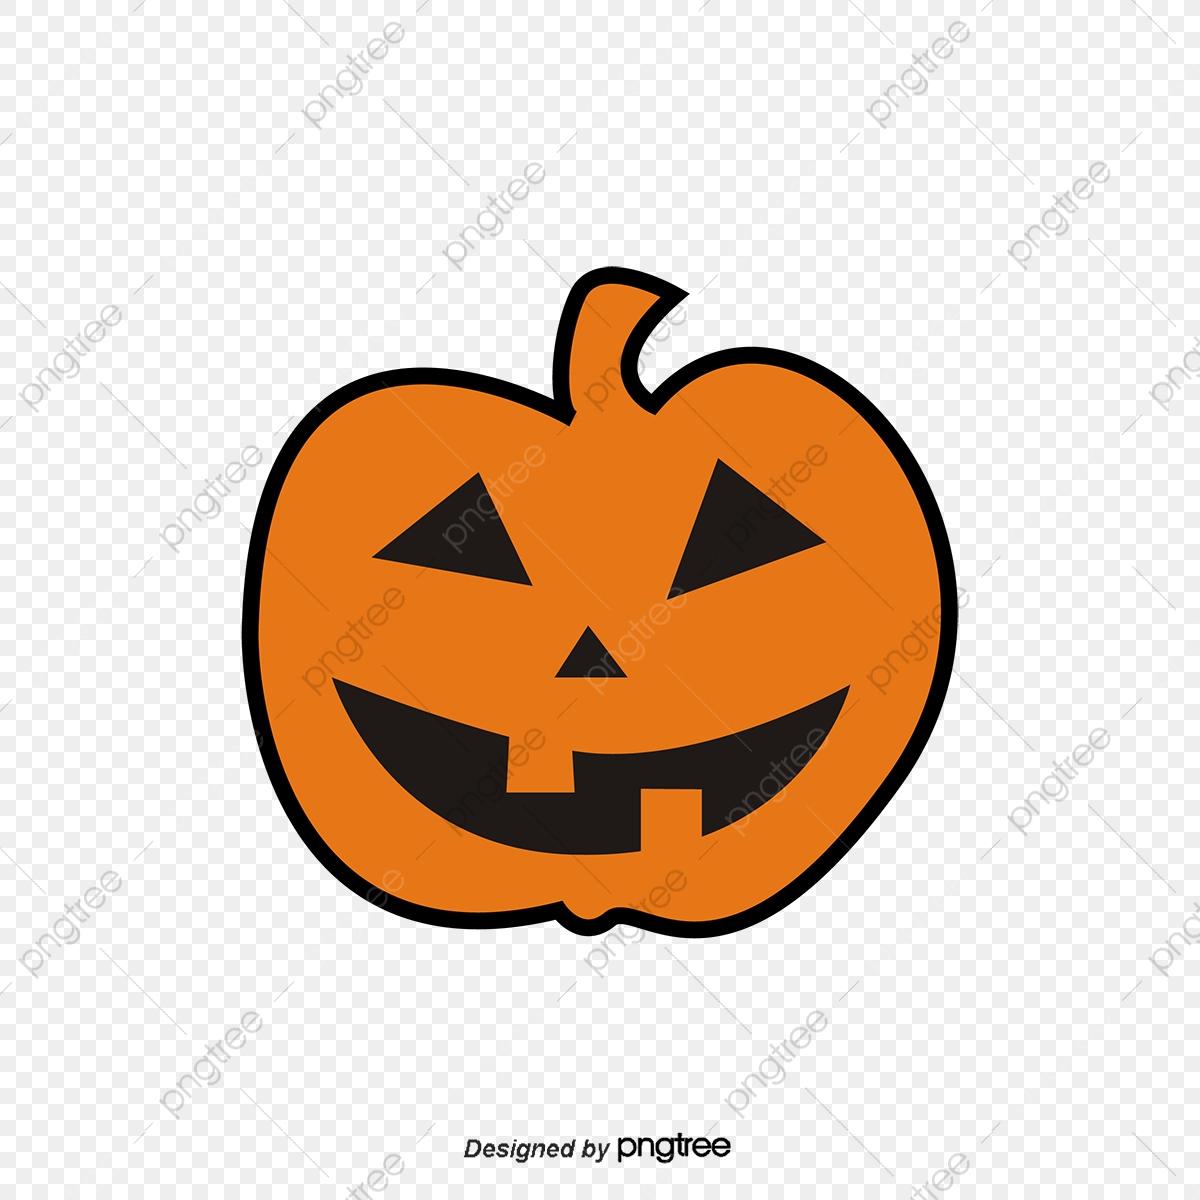 Jolie Citrouille D'halloween, Halloween, Citrouille, Orange concernant Photo De Citrouille D Halloween